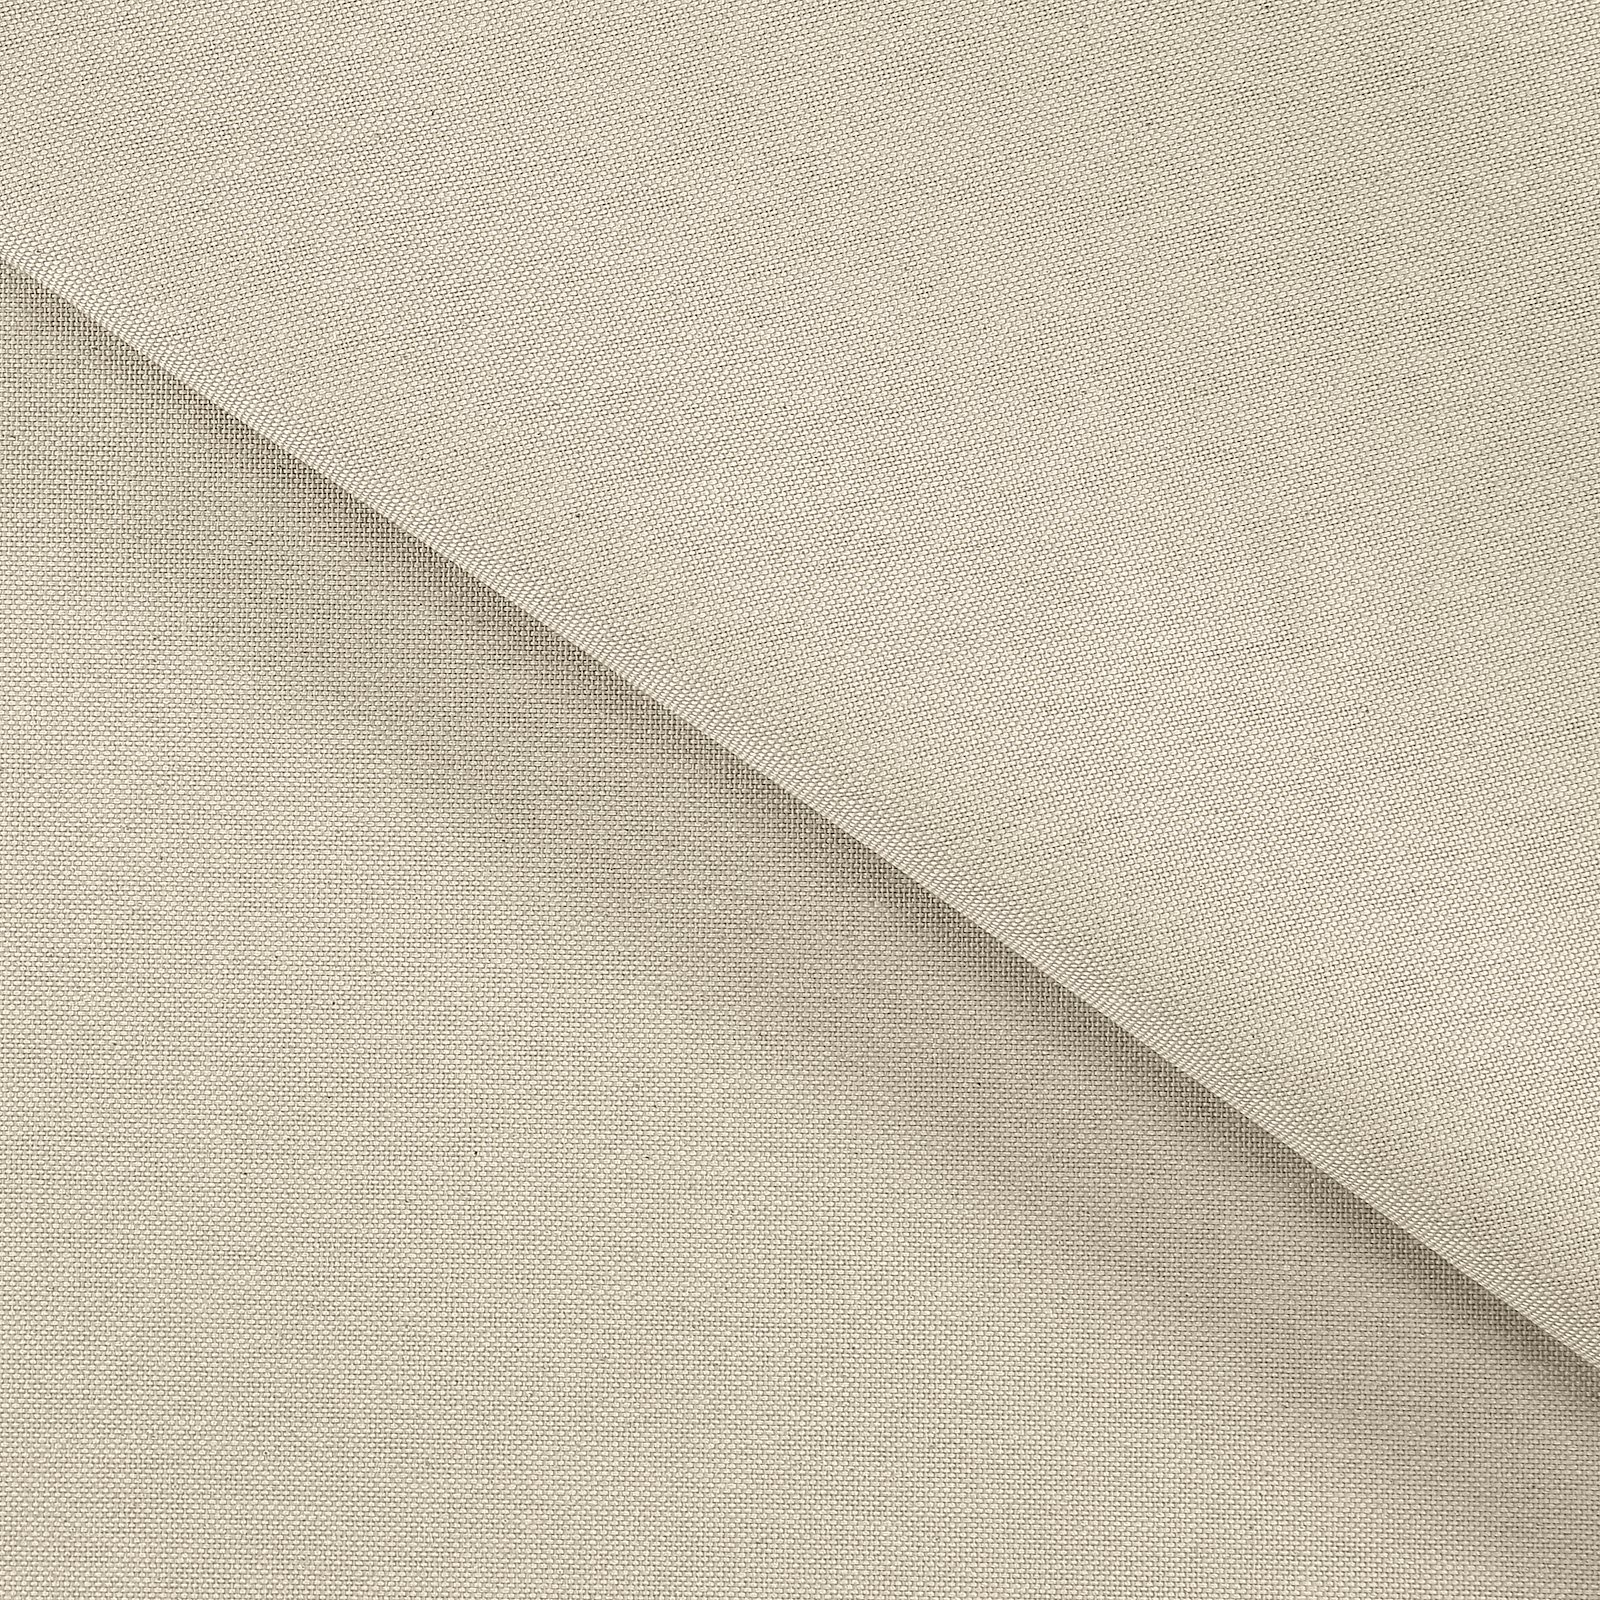 Woven oilcloth linen look/ l grey 160 cm 872301_pack